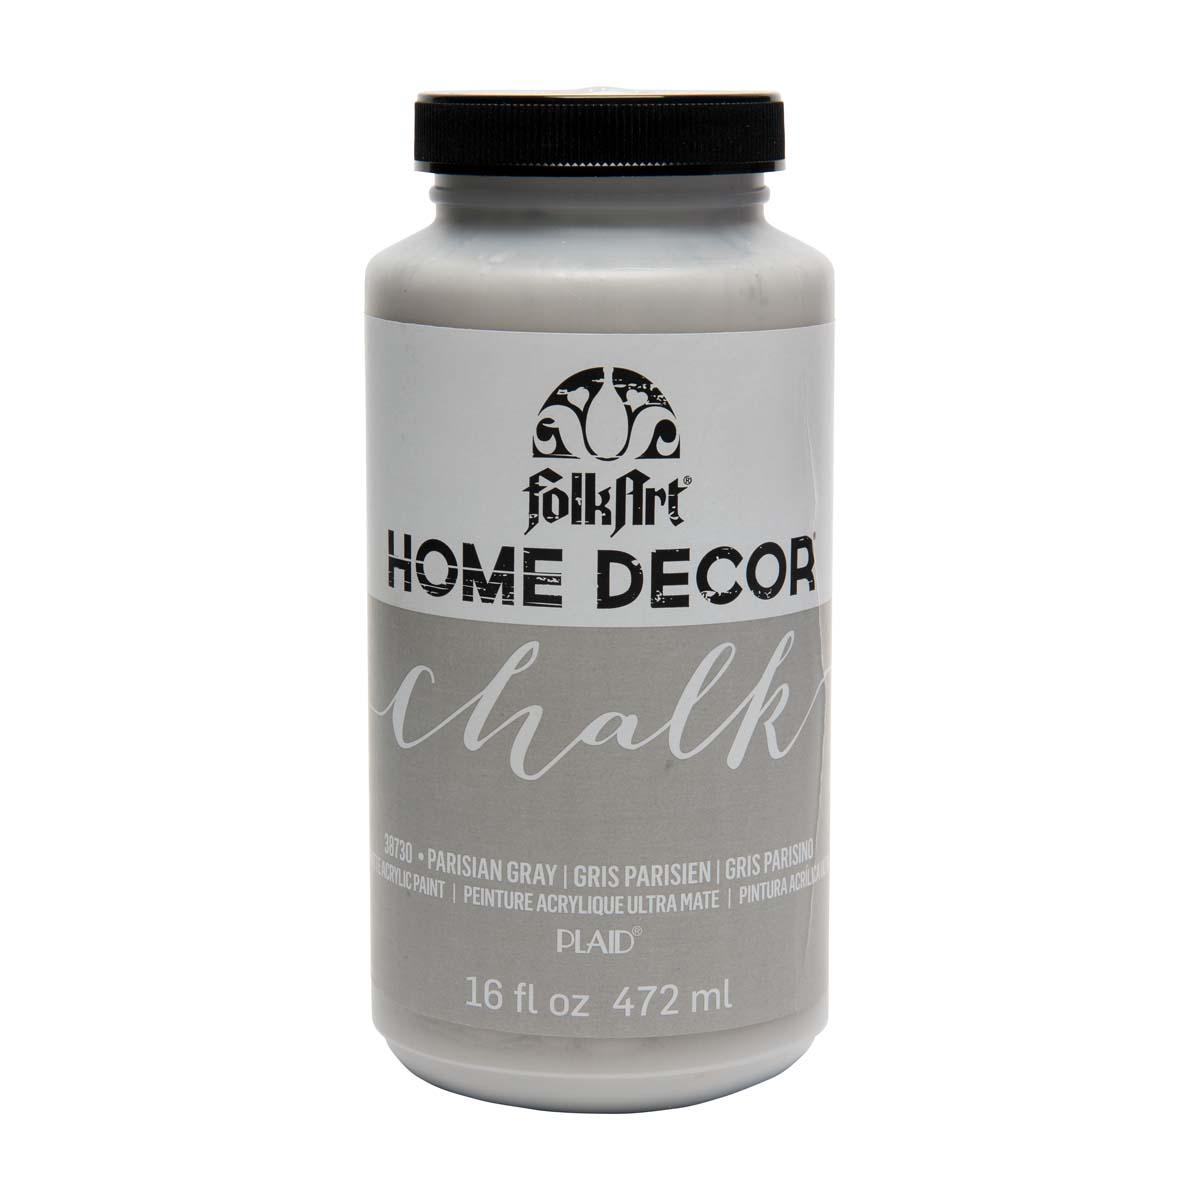 FolkArt ® Home Decor™ Chalk - Parisian Grey, 16 oz. - 38730